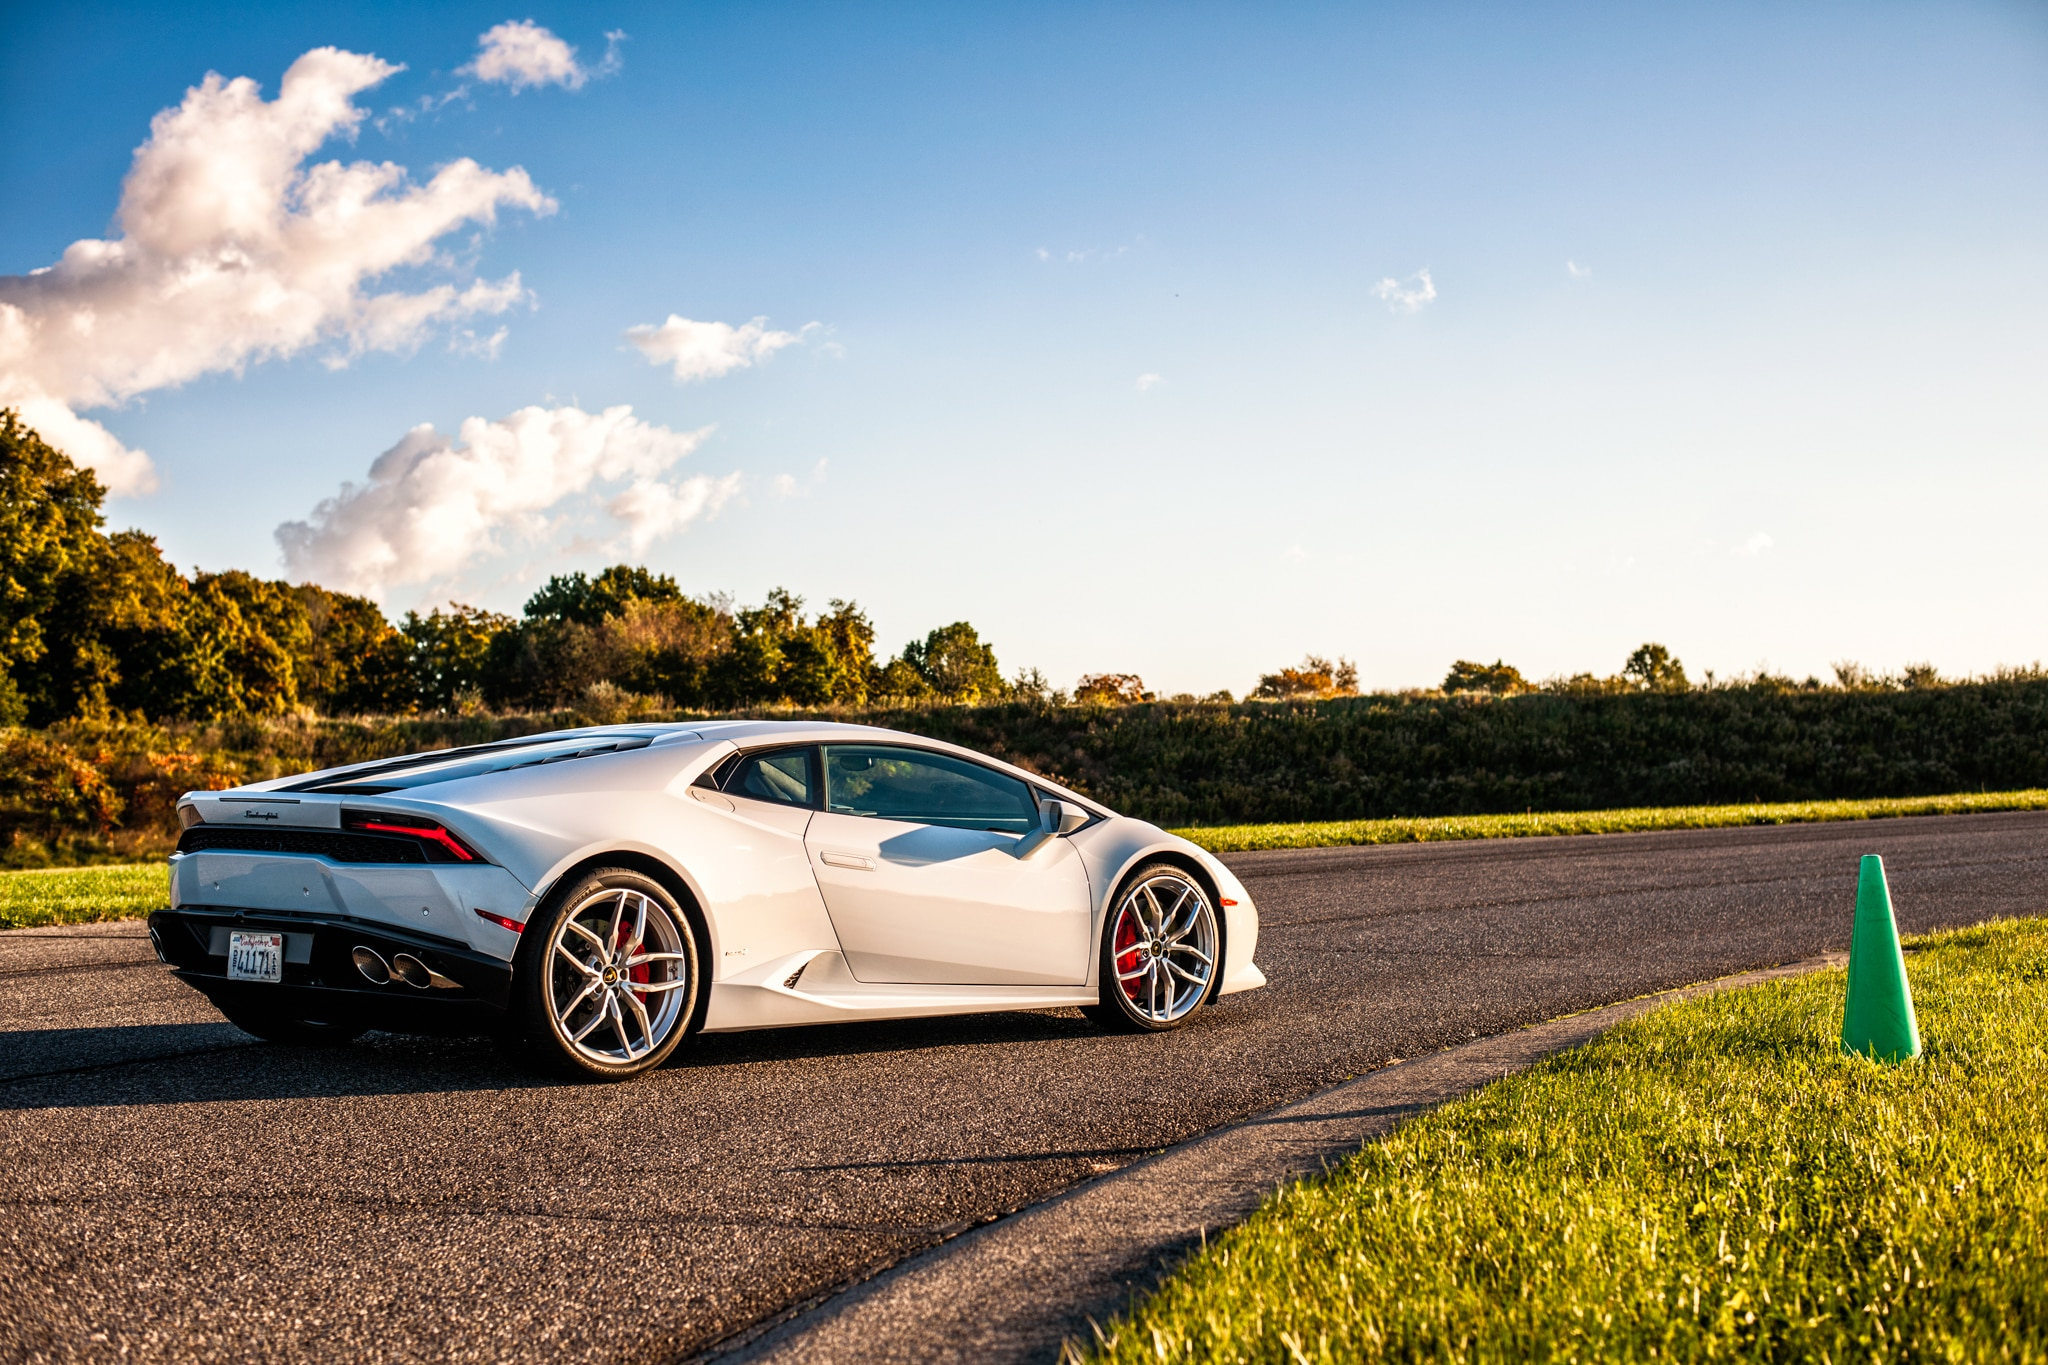 BMW I8 Mpg >> Lamborghini Huracán: 2015 AUTOMOBILE All-Star | Automobile ...